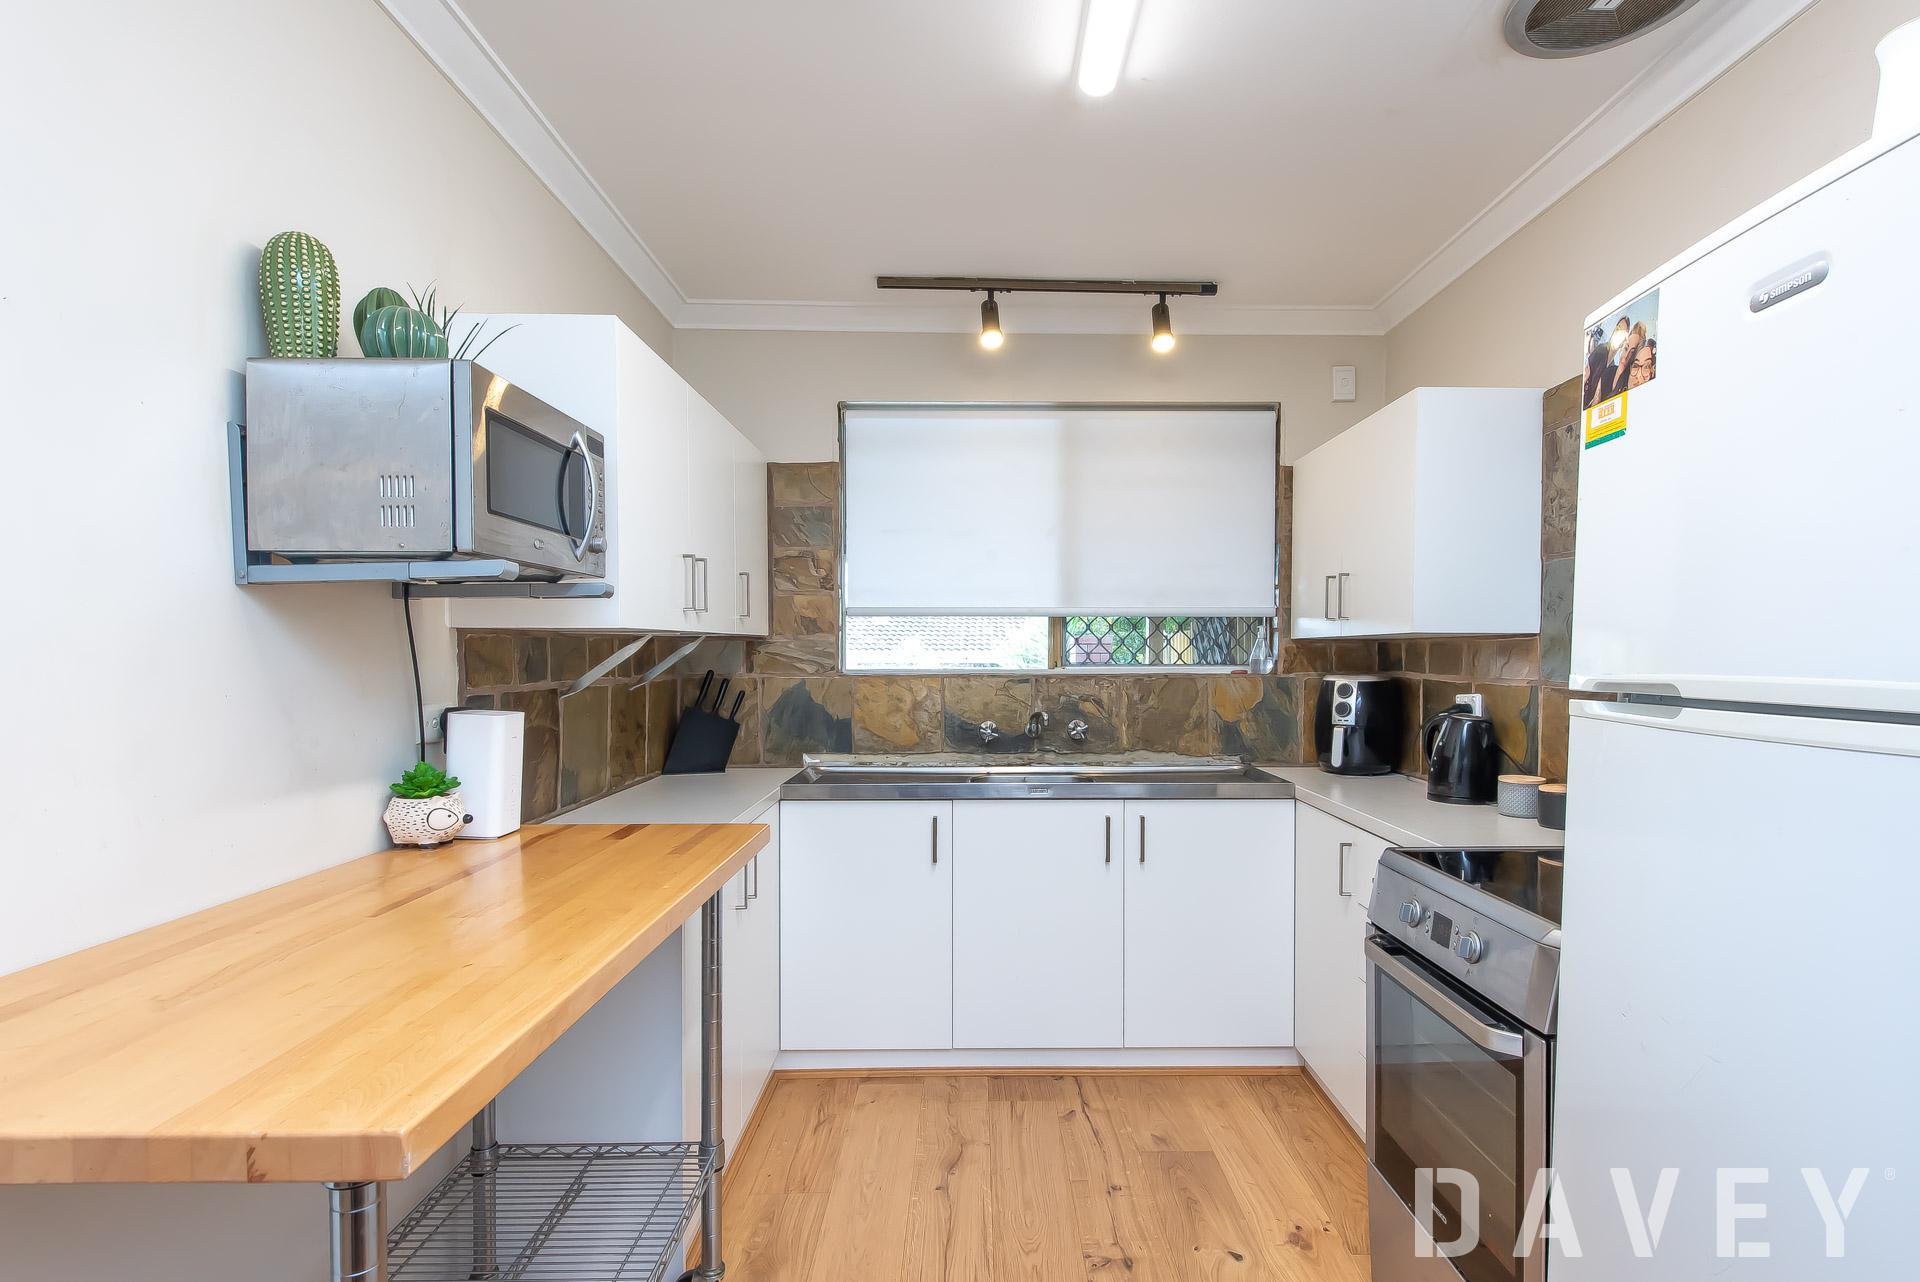 Spacious home with an actual backyard in a vibrant coastal suburb